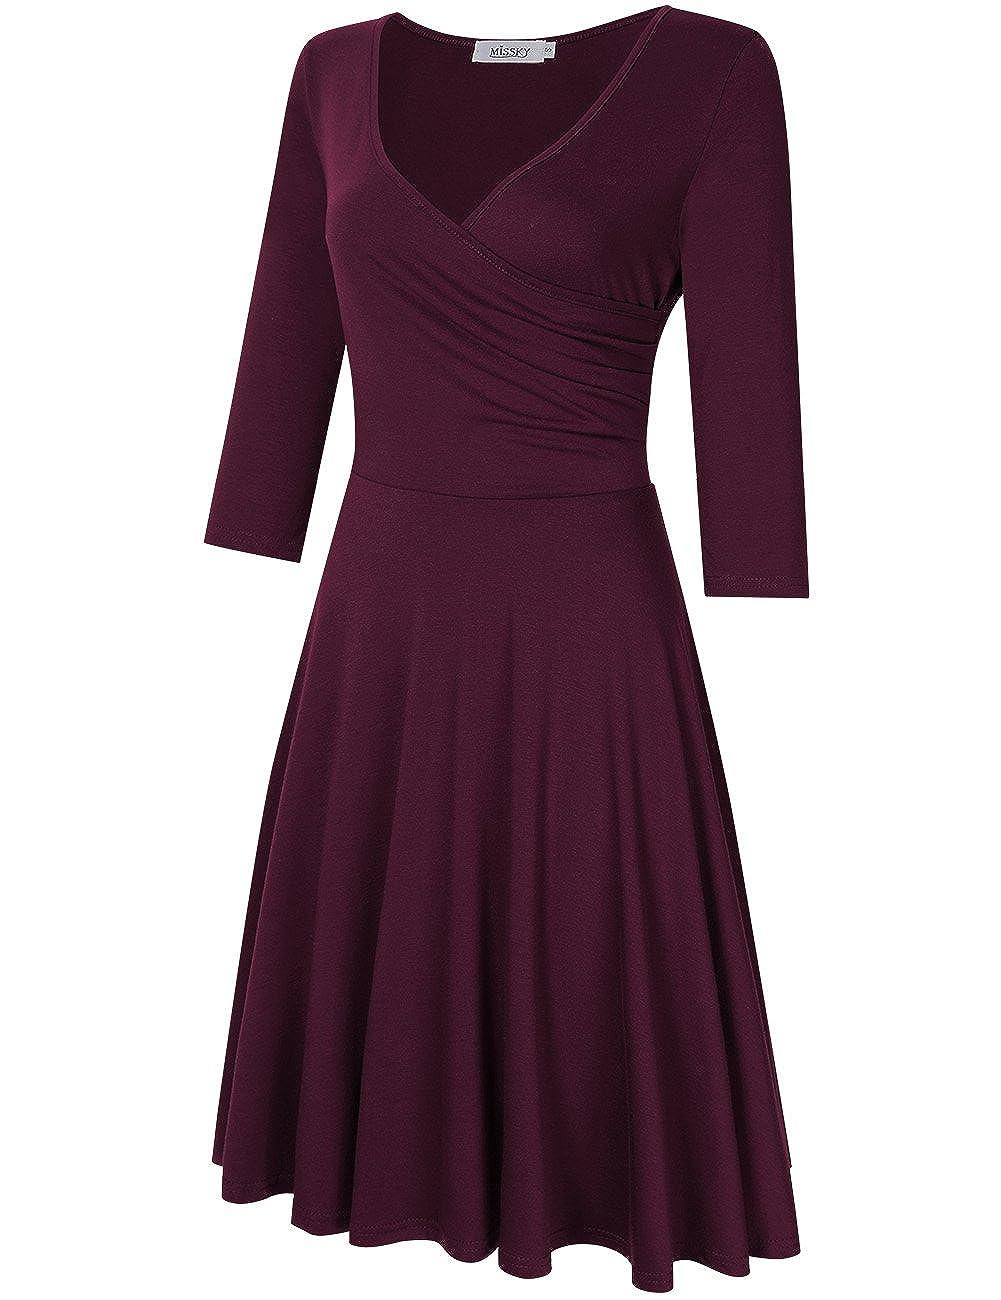 4987e218e354 Vintage Long Dresses Amazon - raveitsafe